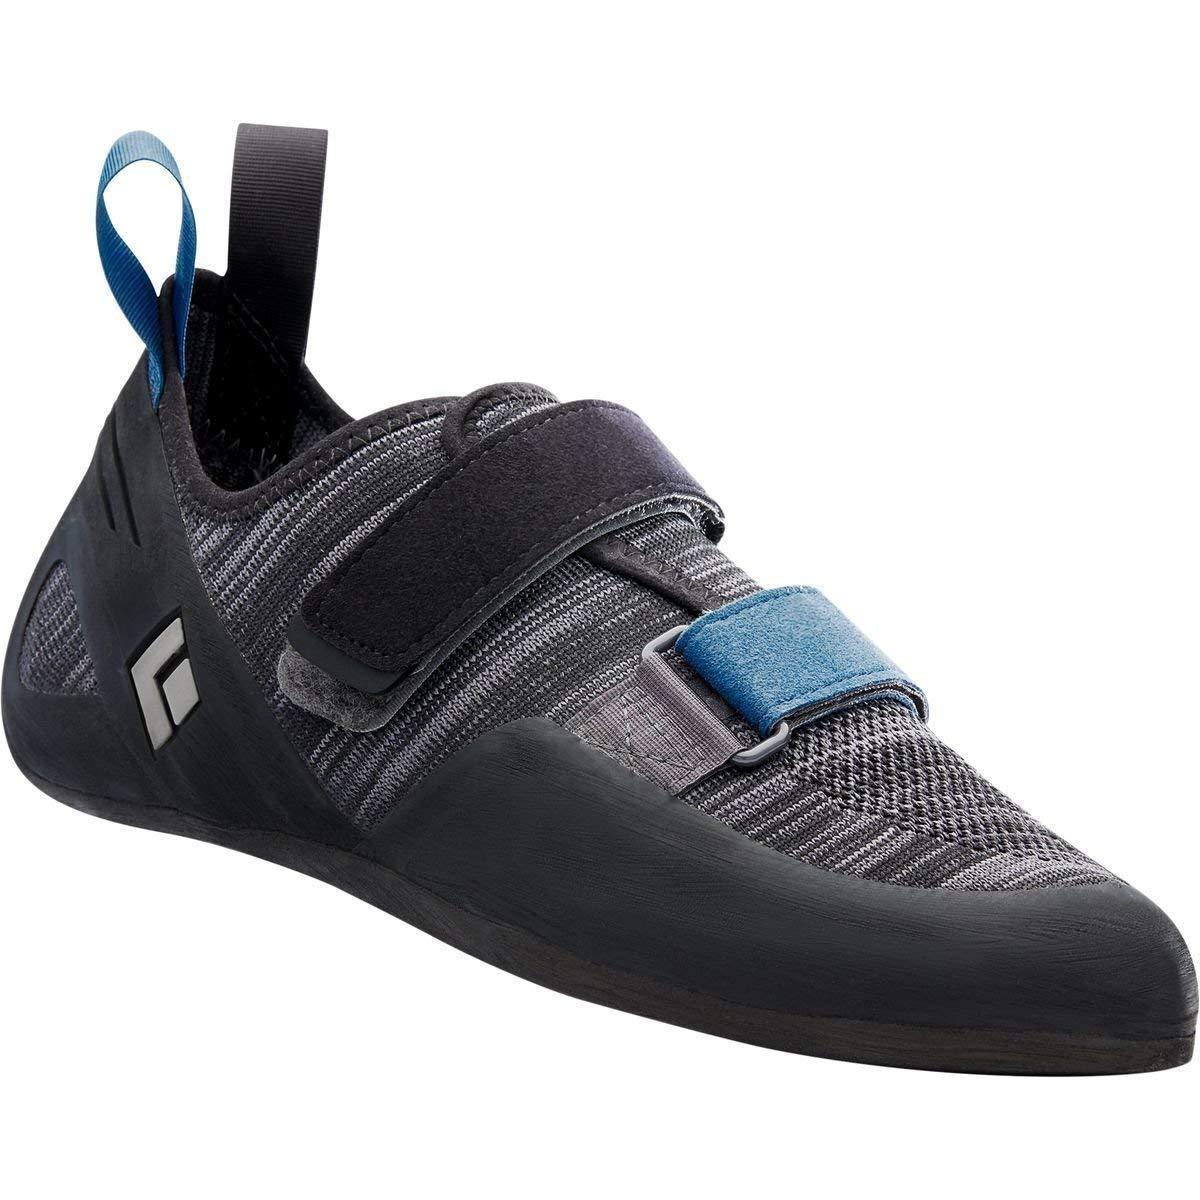 Black Diamond Momentum Grey Climbing Shoes